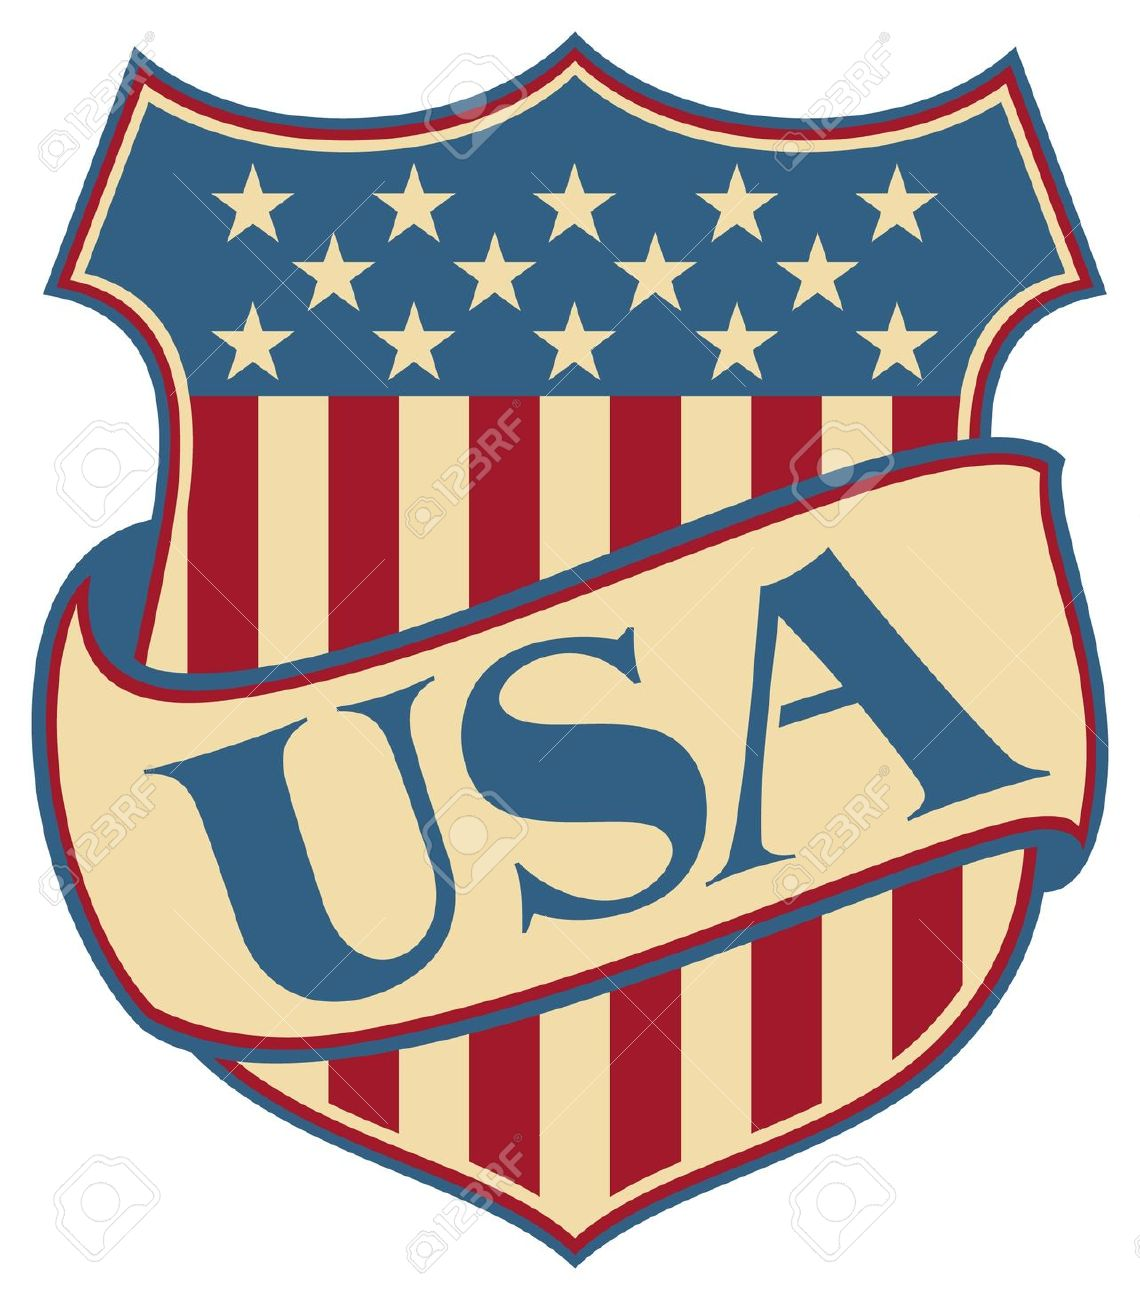 American Symbols Clipart At Getdrawings